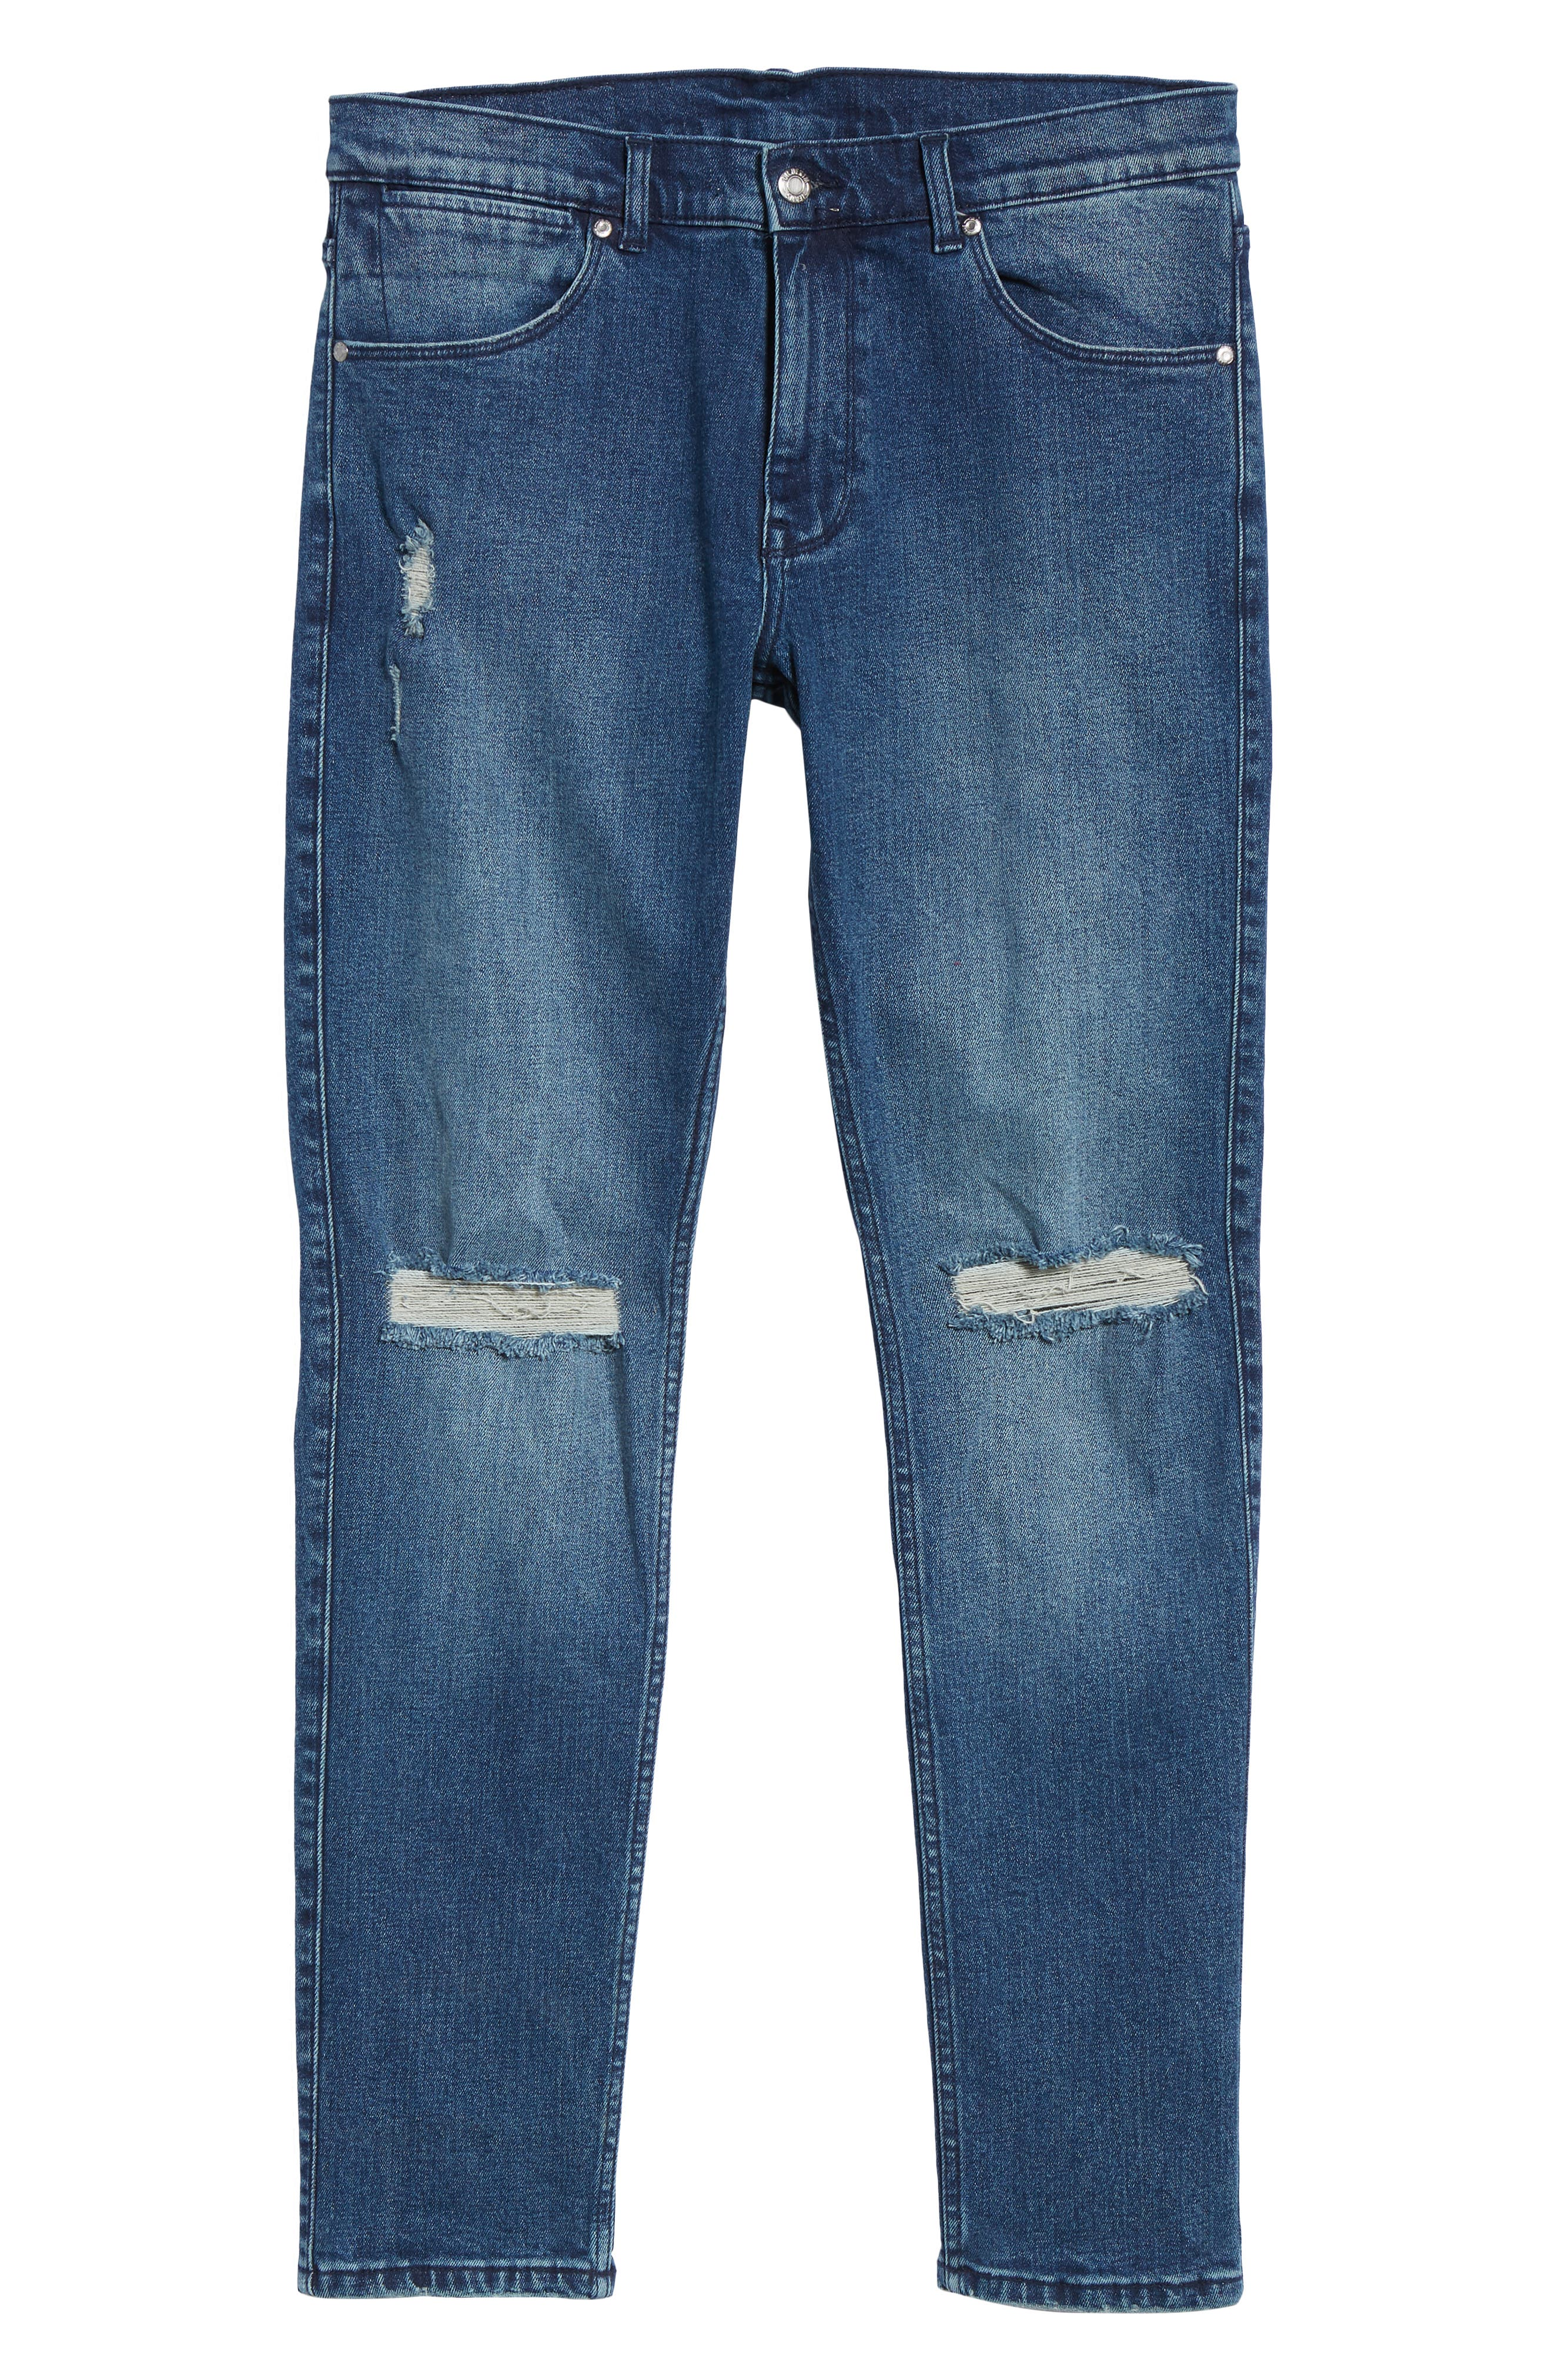 Clark Slim Straight Leg Jeans,                             Alternate thumbnail 6, color,                             WORN ASH BLUE DAMAGED